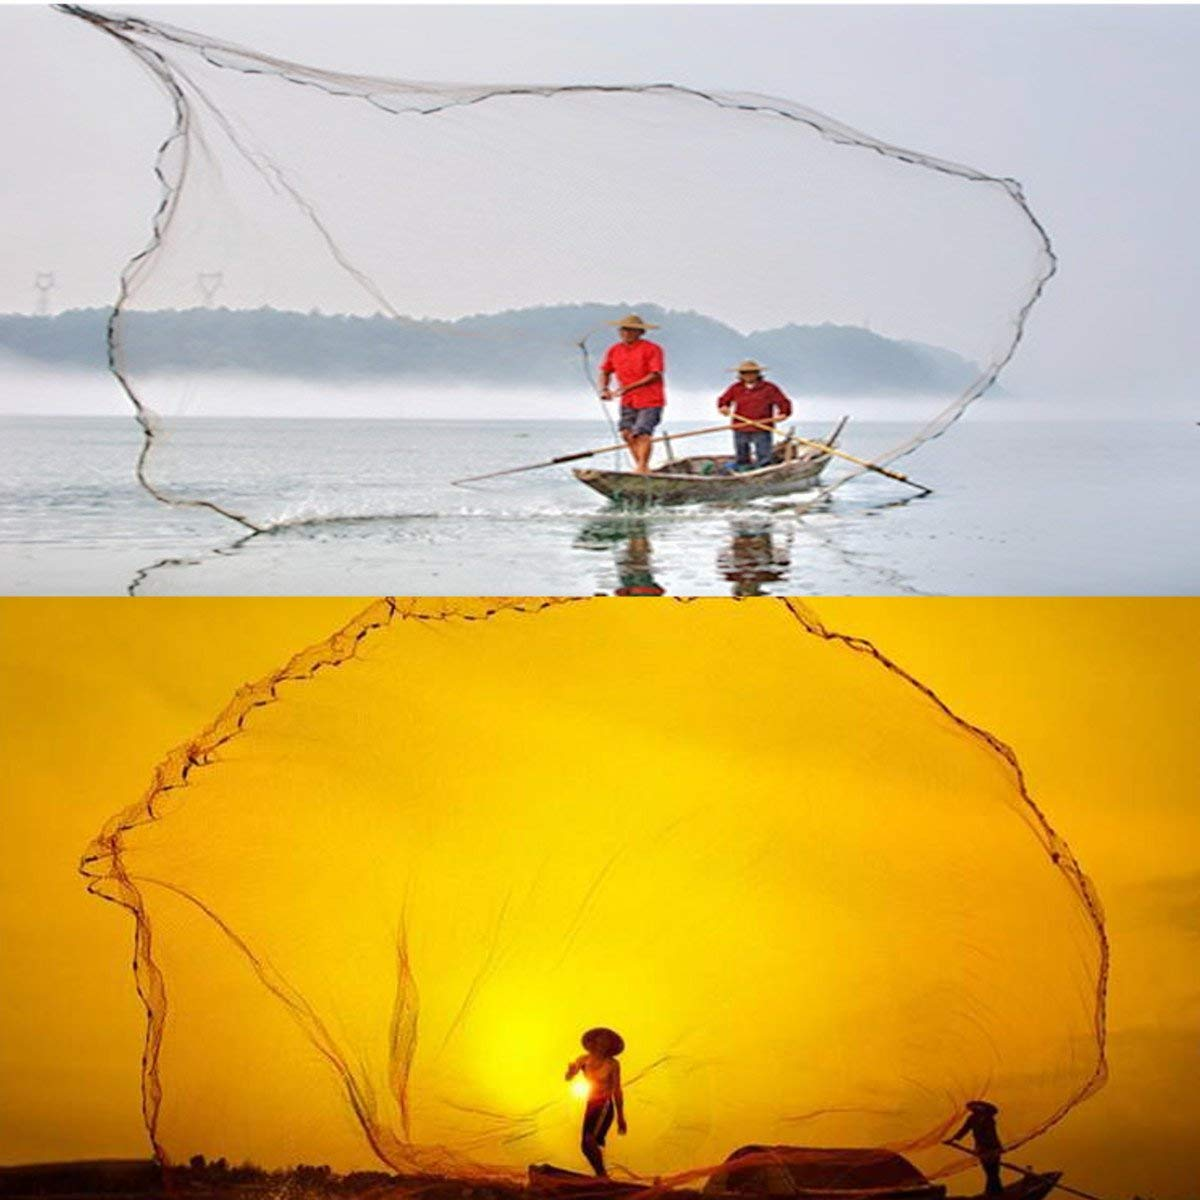 Persei American Saltwater Fishing Cast Net for Bait Trap Fish 4//5//6//7//8//9//10//11//12-Feet Radius Mesh Size 1//2inch 49 Feet Braided Hand line